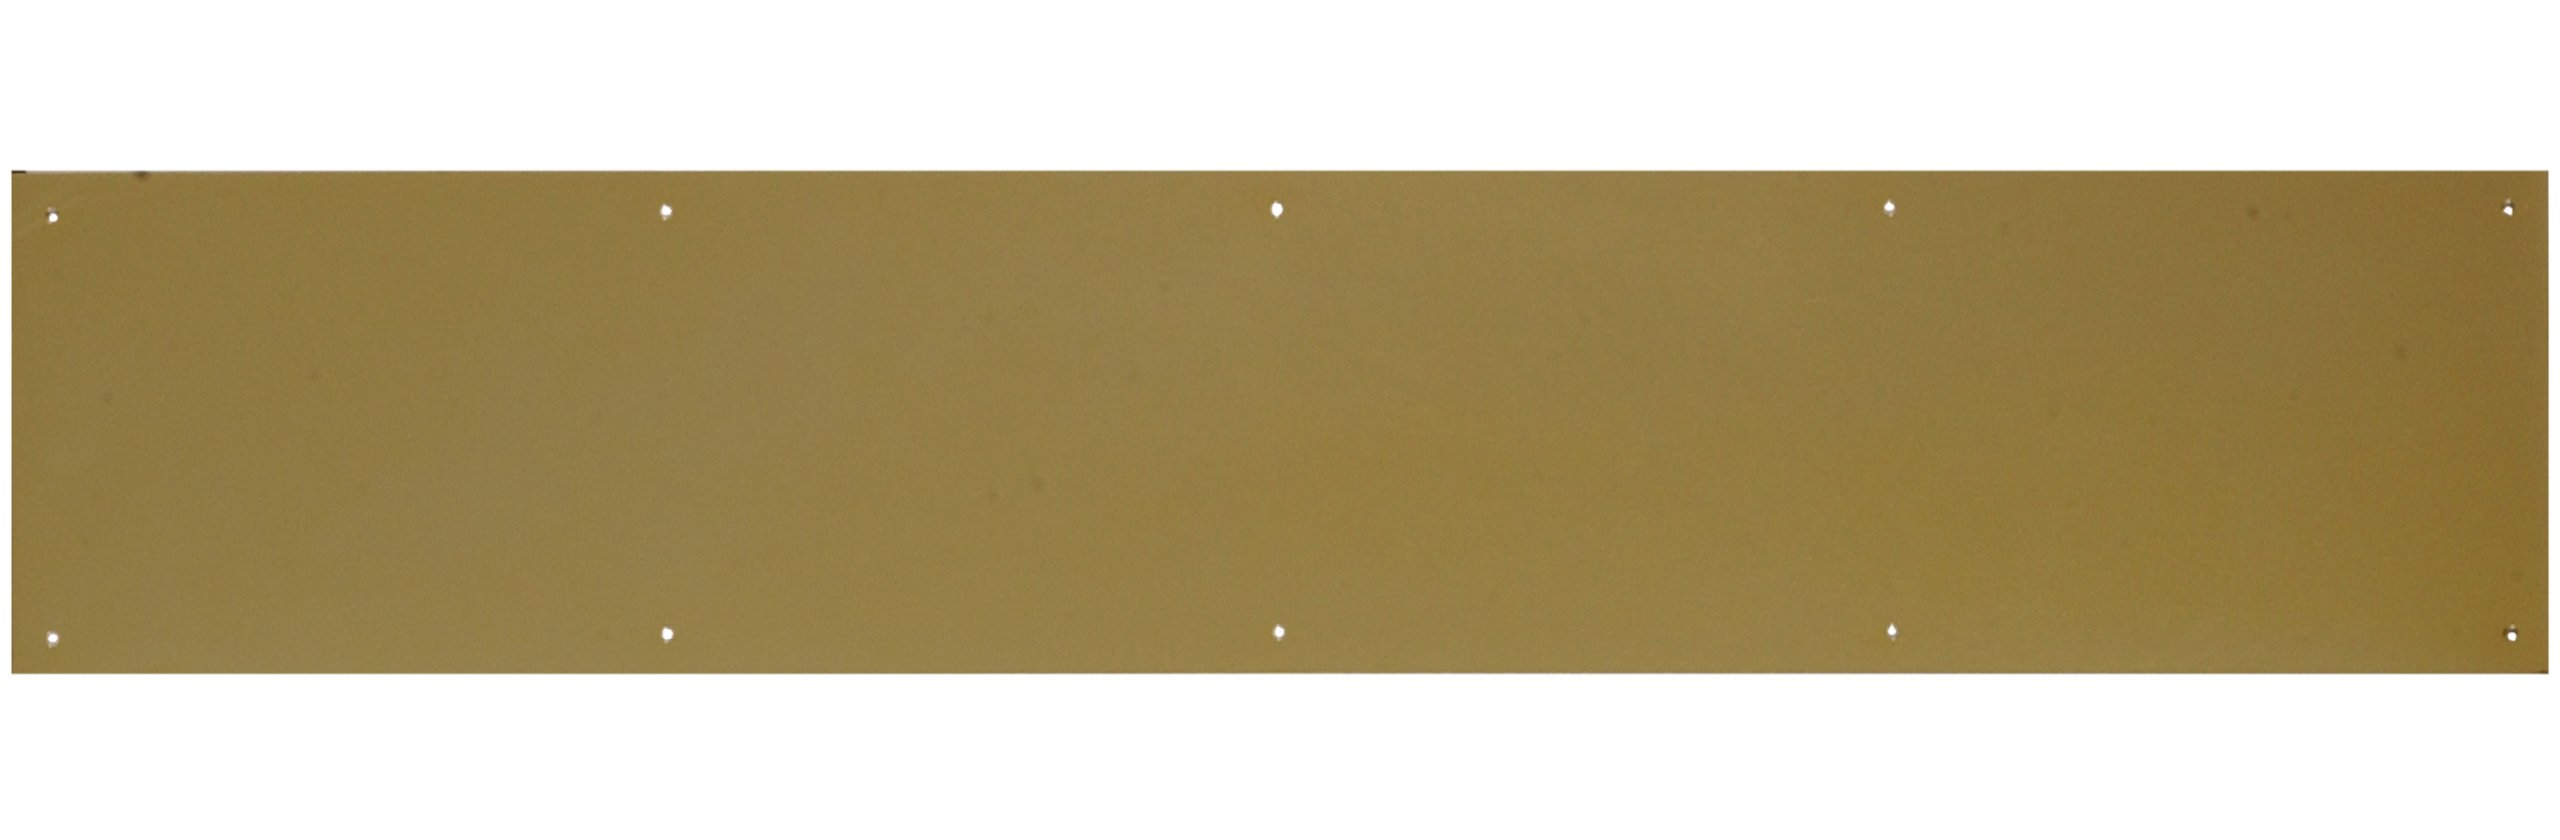 The Hillman Group 852739 6 x 34'' Aluminum Kick Plate - Bright Brass Finish 1-Pack